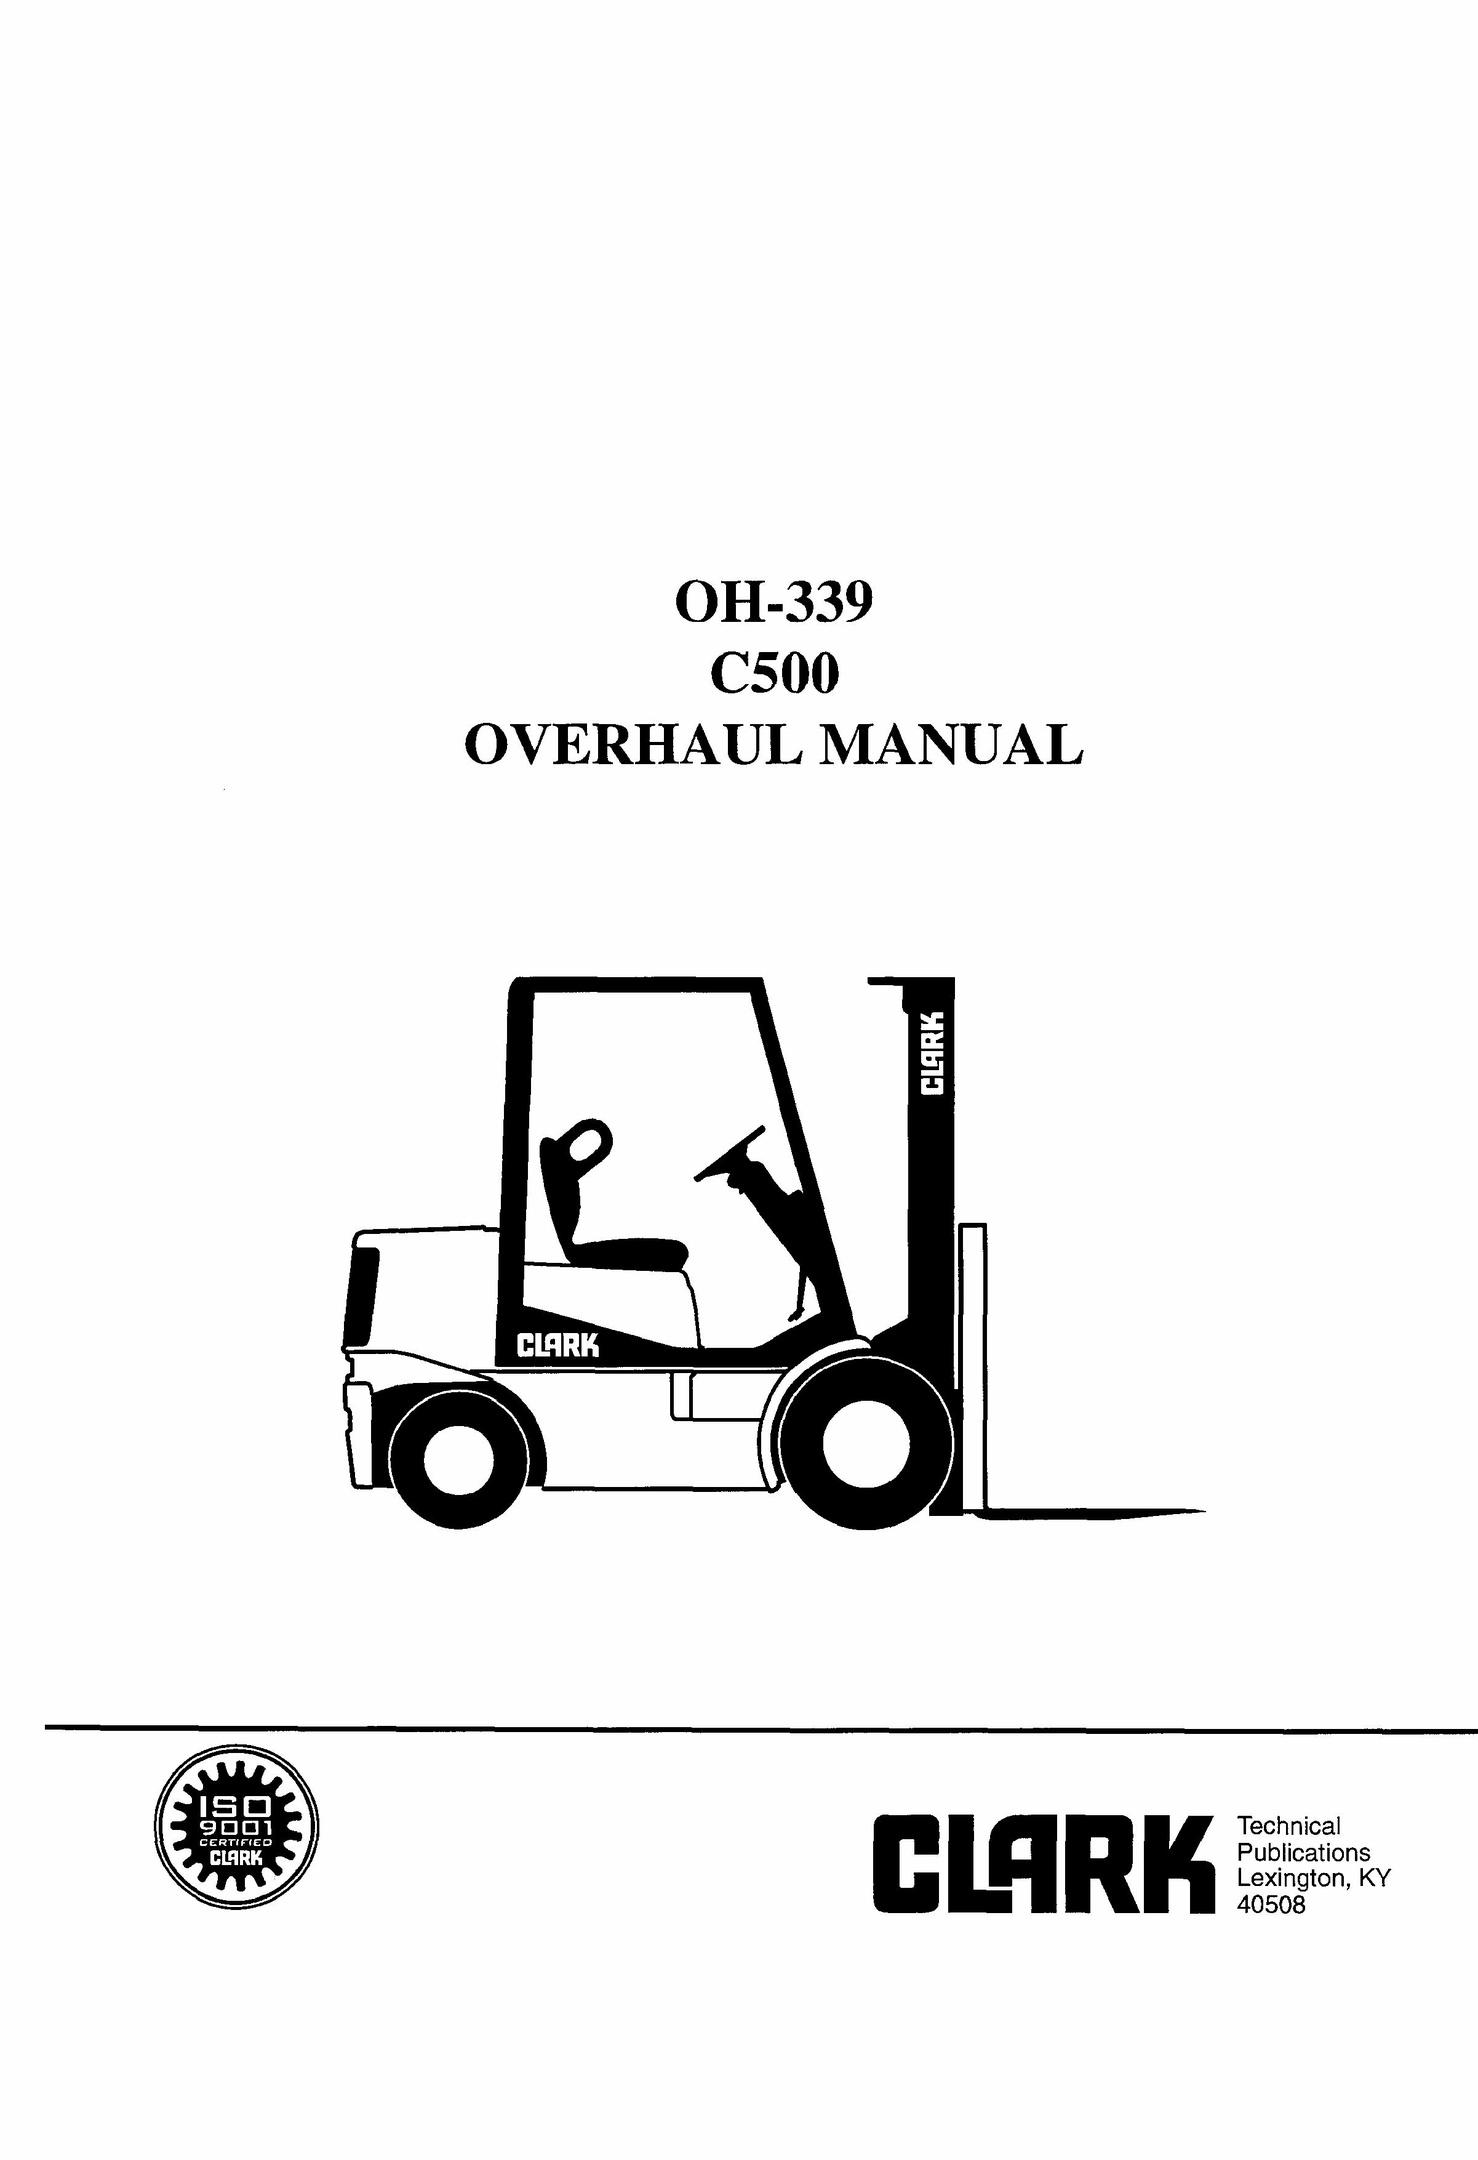 download clark c500 y 30 55 forklift service repair w rh sellfy com clark forklift manual c500-50 free clark forklift manuals cmp25l